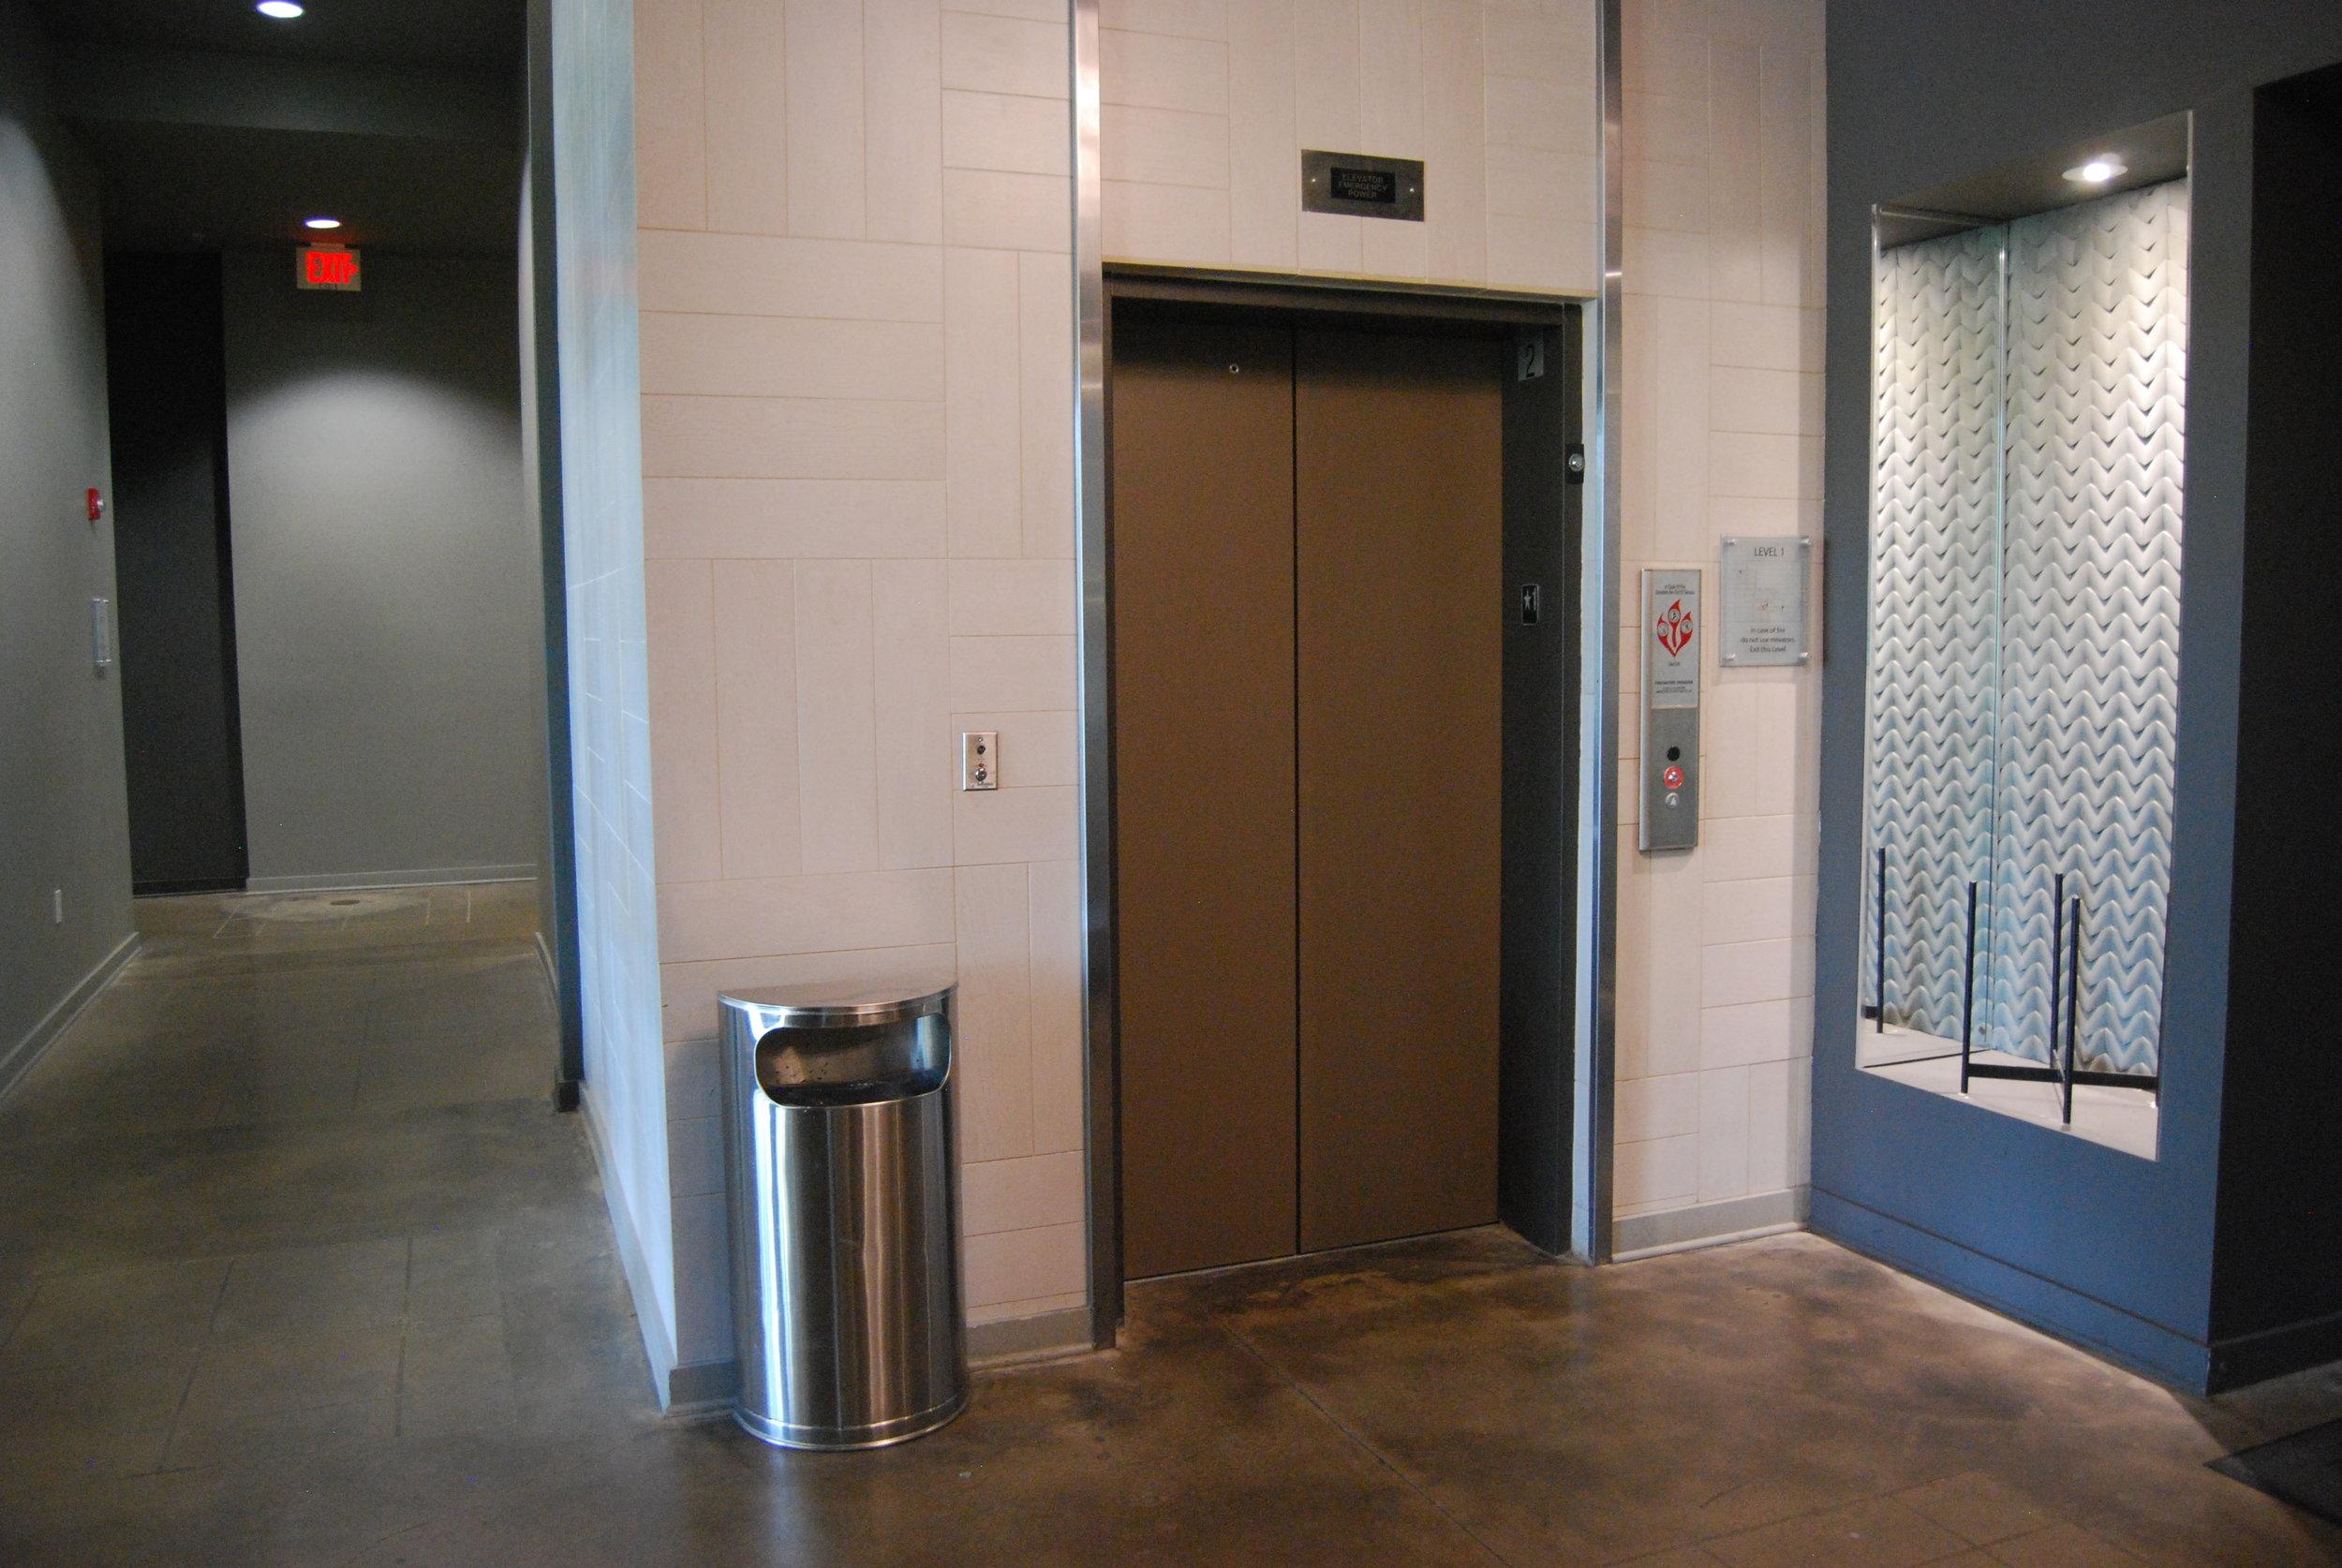 Ground Elevator_01 copy.JPG